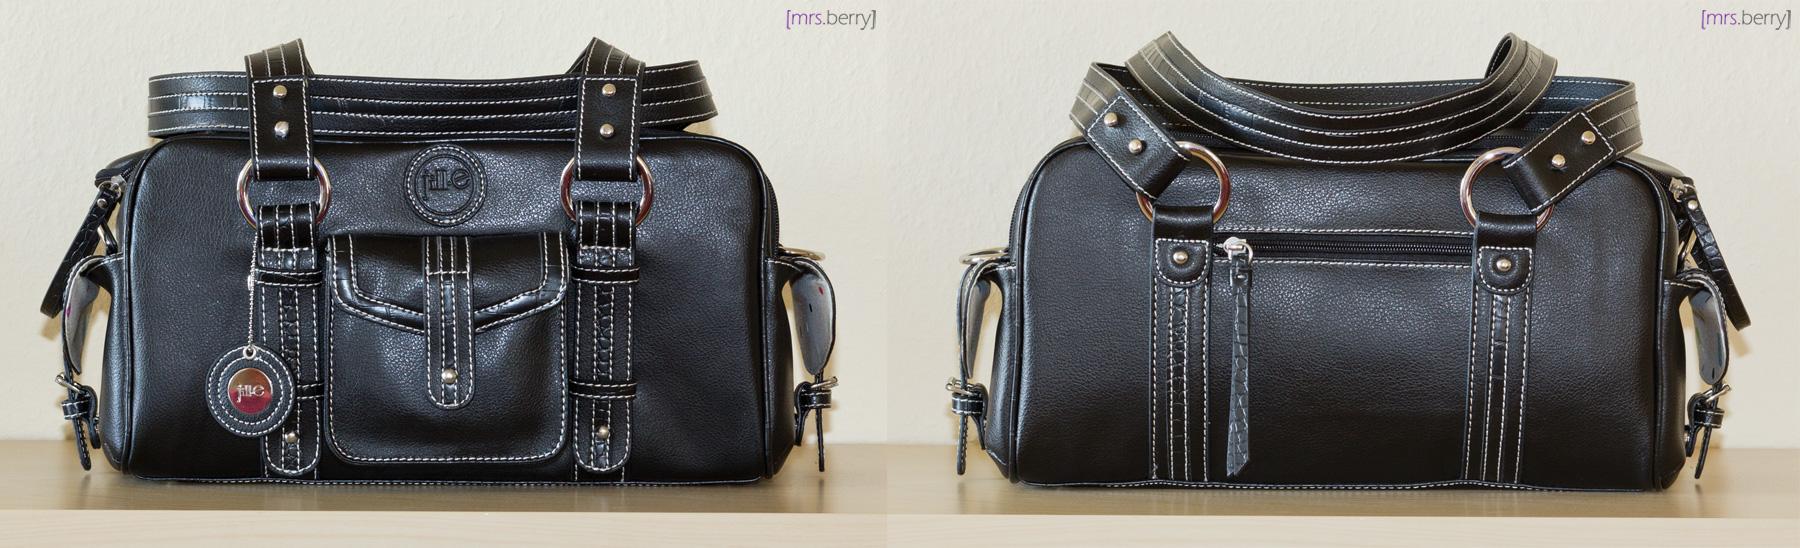 Jill-e Designs Kamera-Handtasche: Small Black Leather Camera/Carry-All Bag